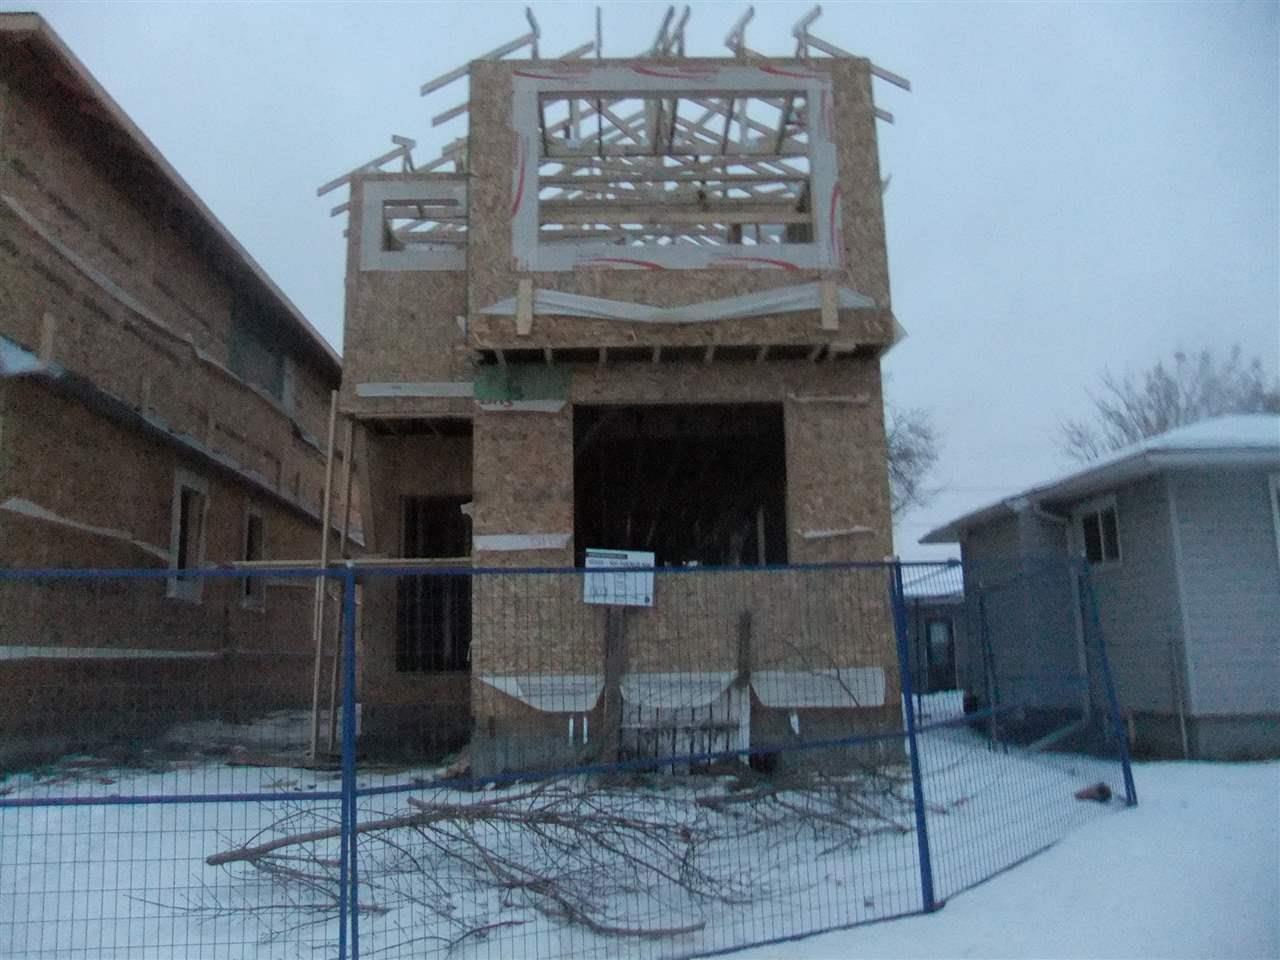 15928 100 Av Nw, Edmonton, Alberta  T5P 0L2 - Photo 1 - E4138945